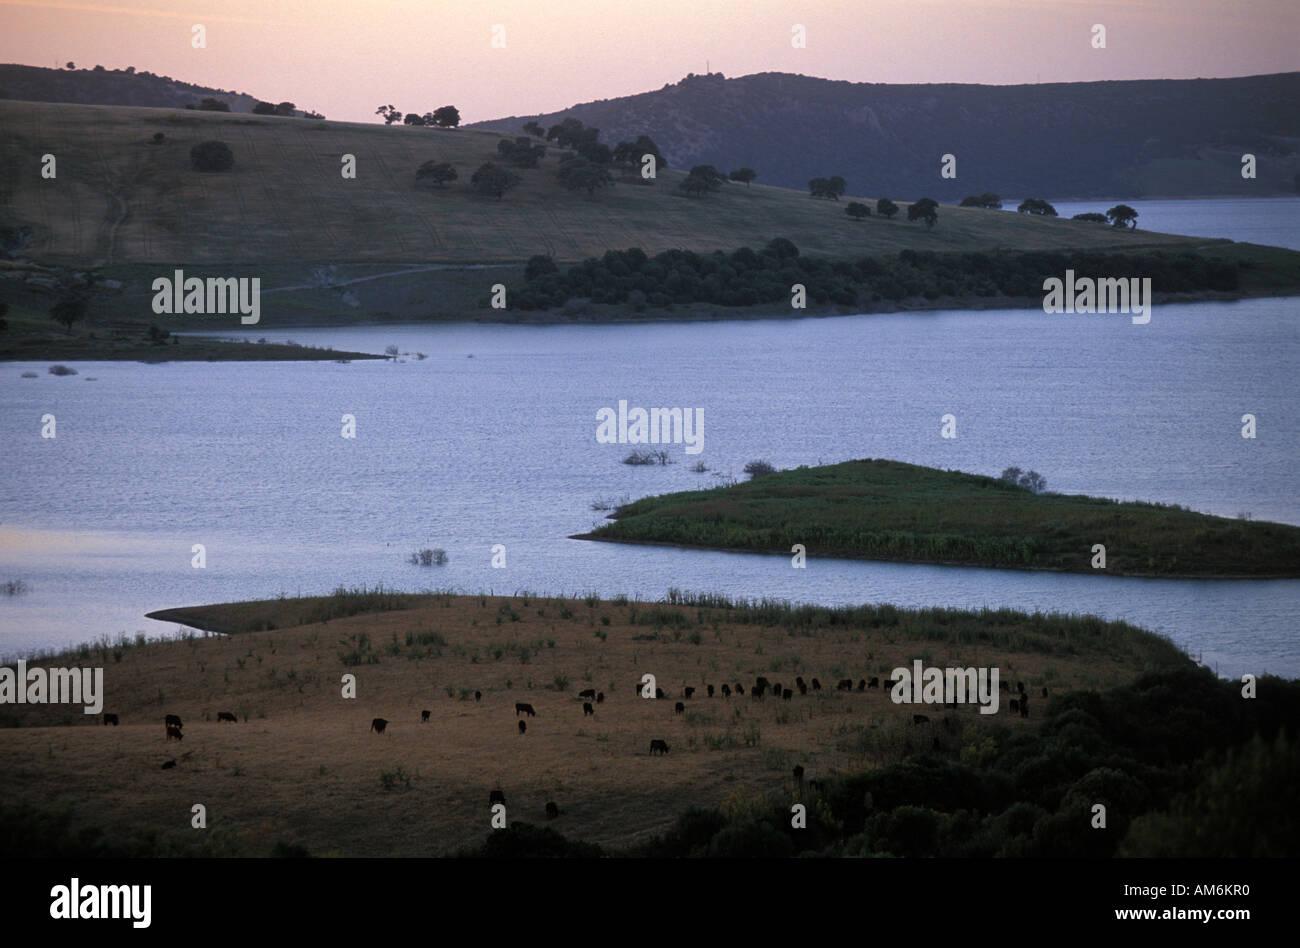 A herd of fighting bulls grazing near an artificial lake - Stock Image